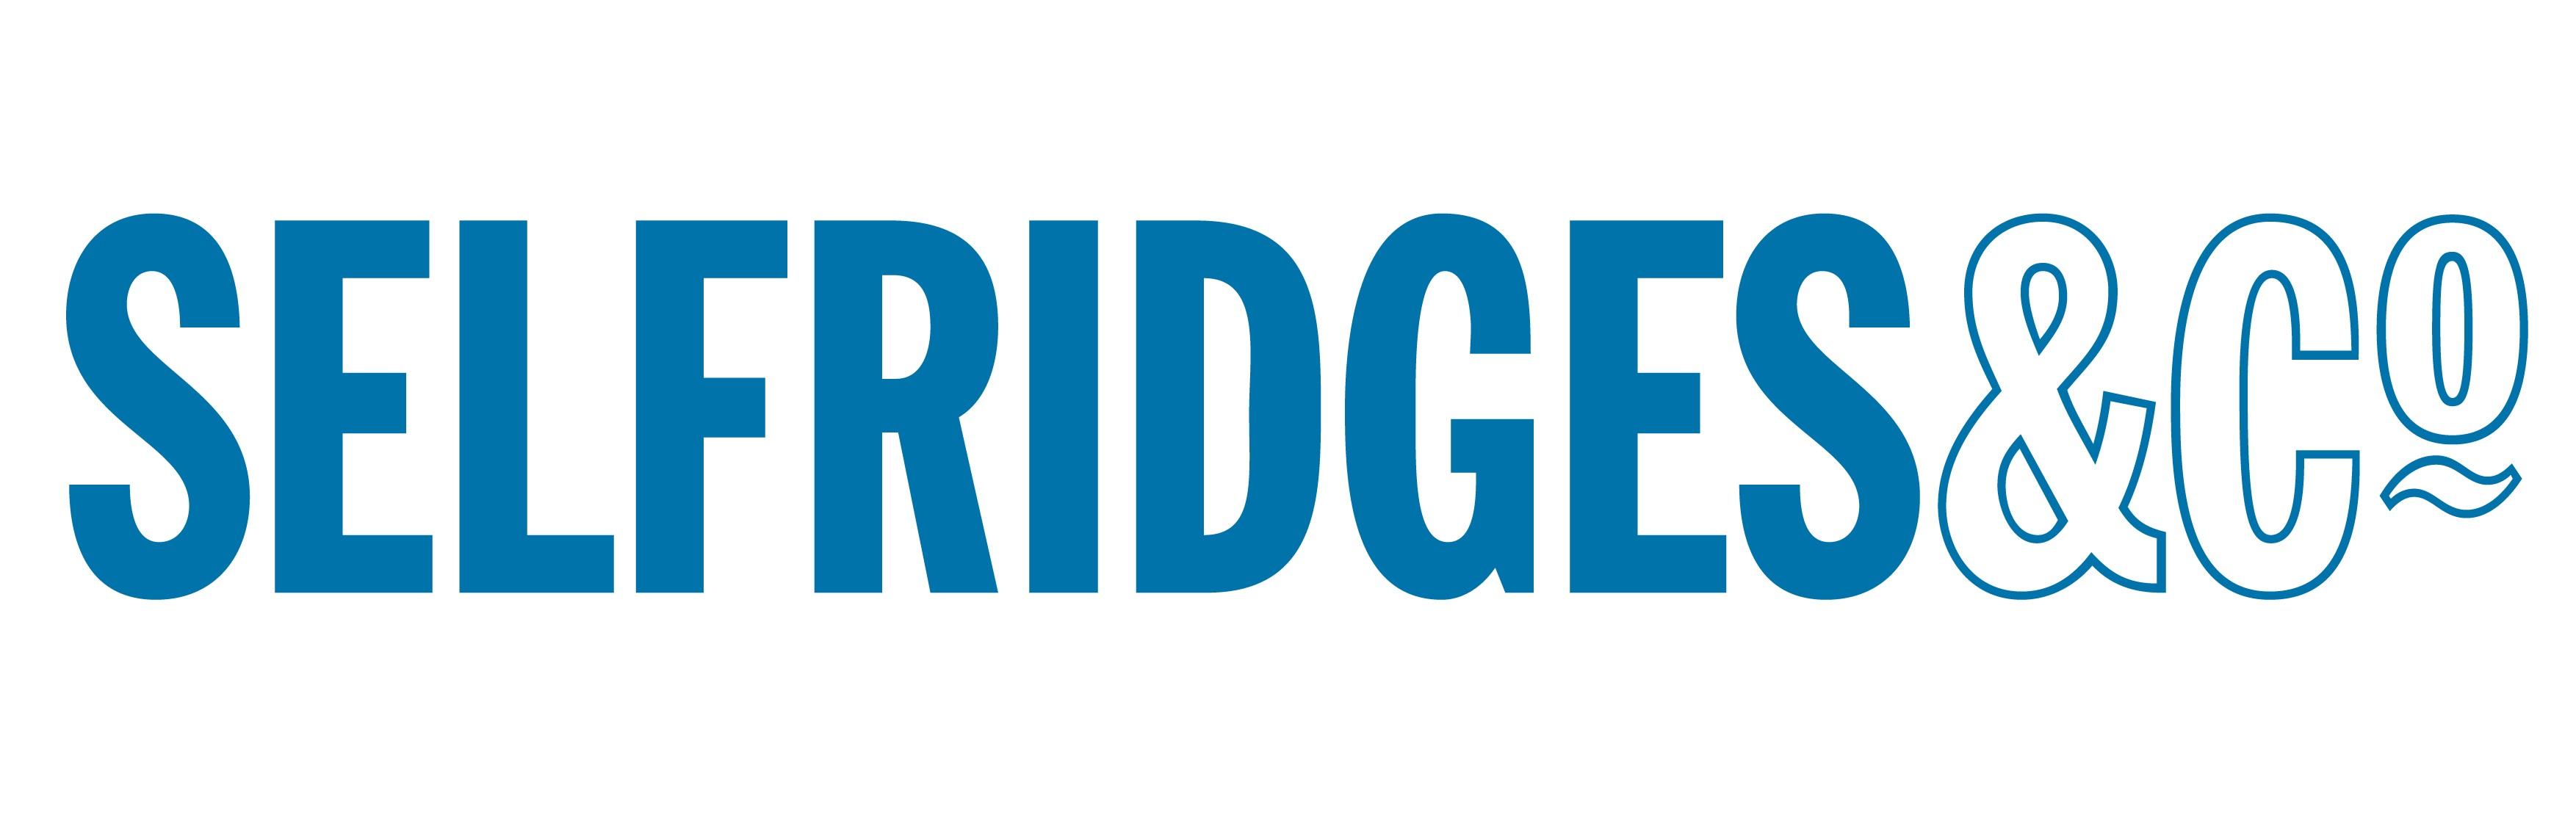 Citigold partnership programme with prestigious brands citi uk thecheapjerseys Choice Image